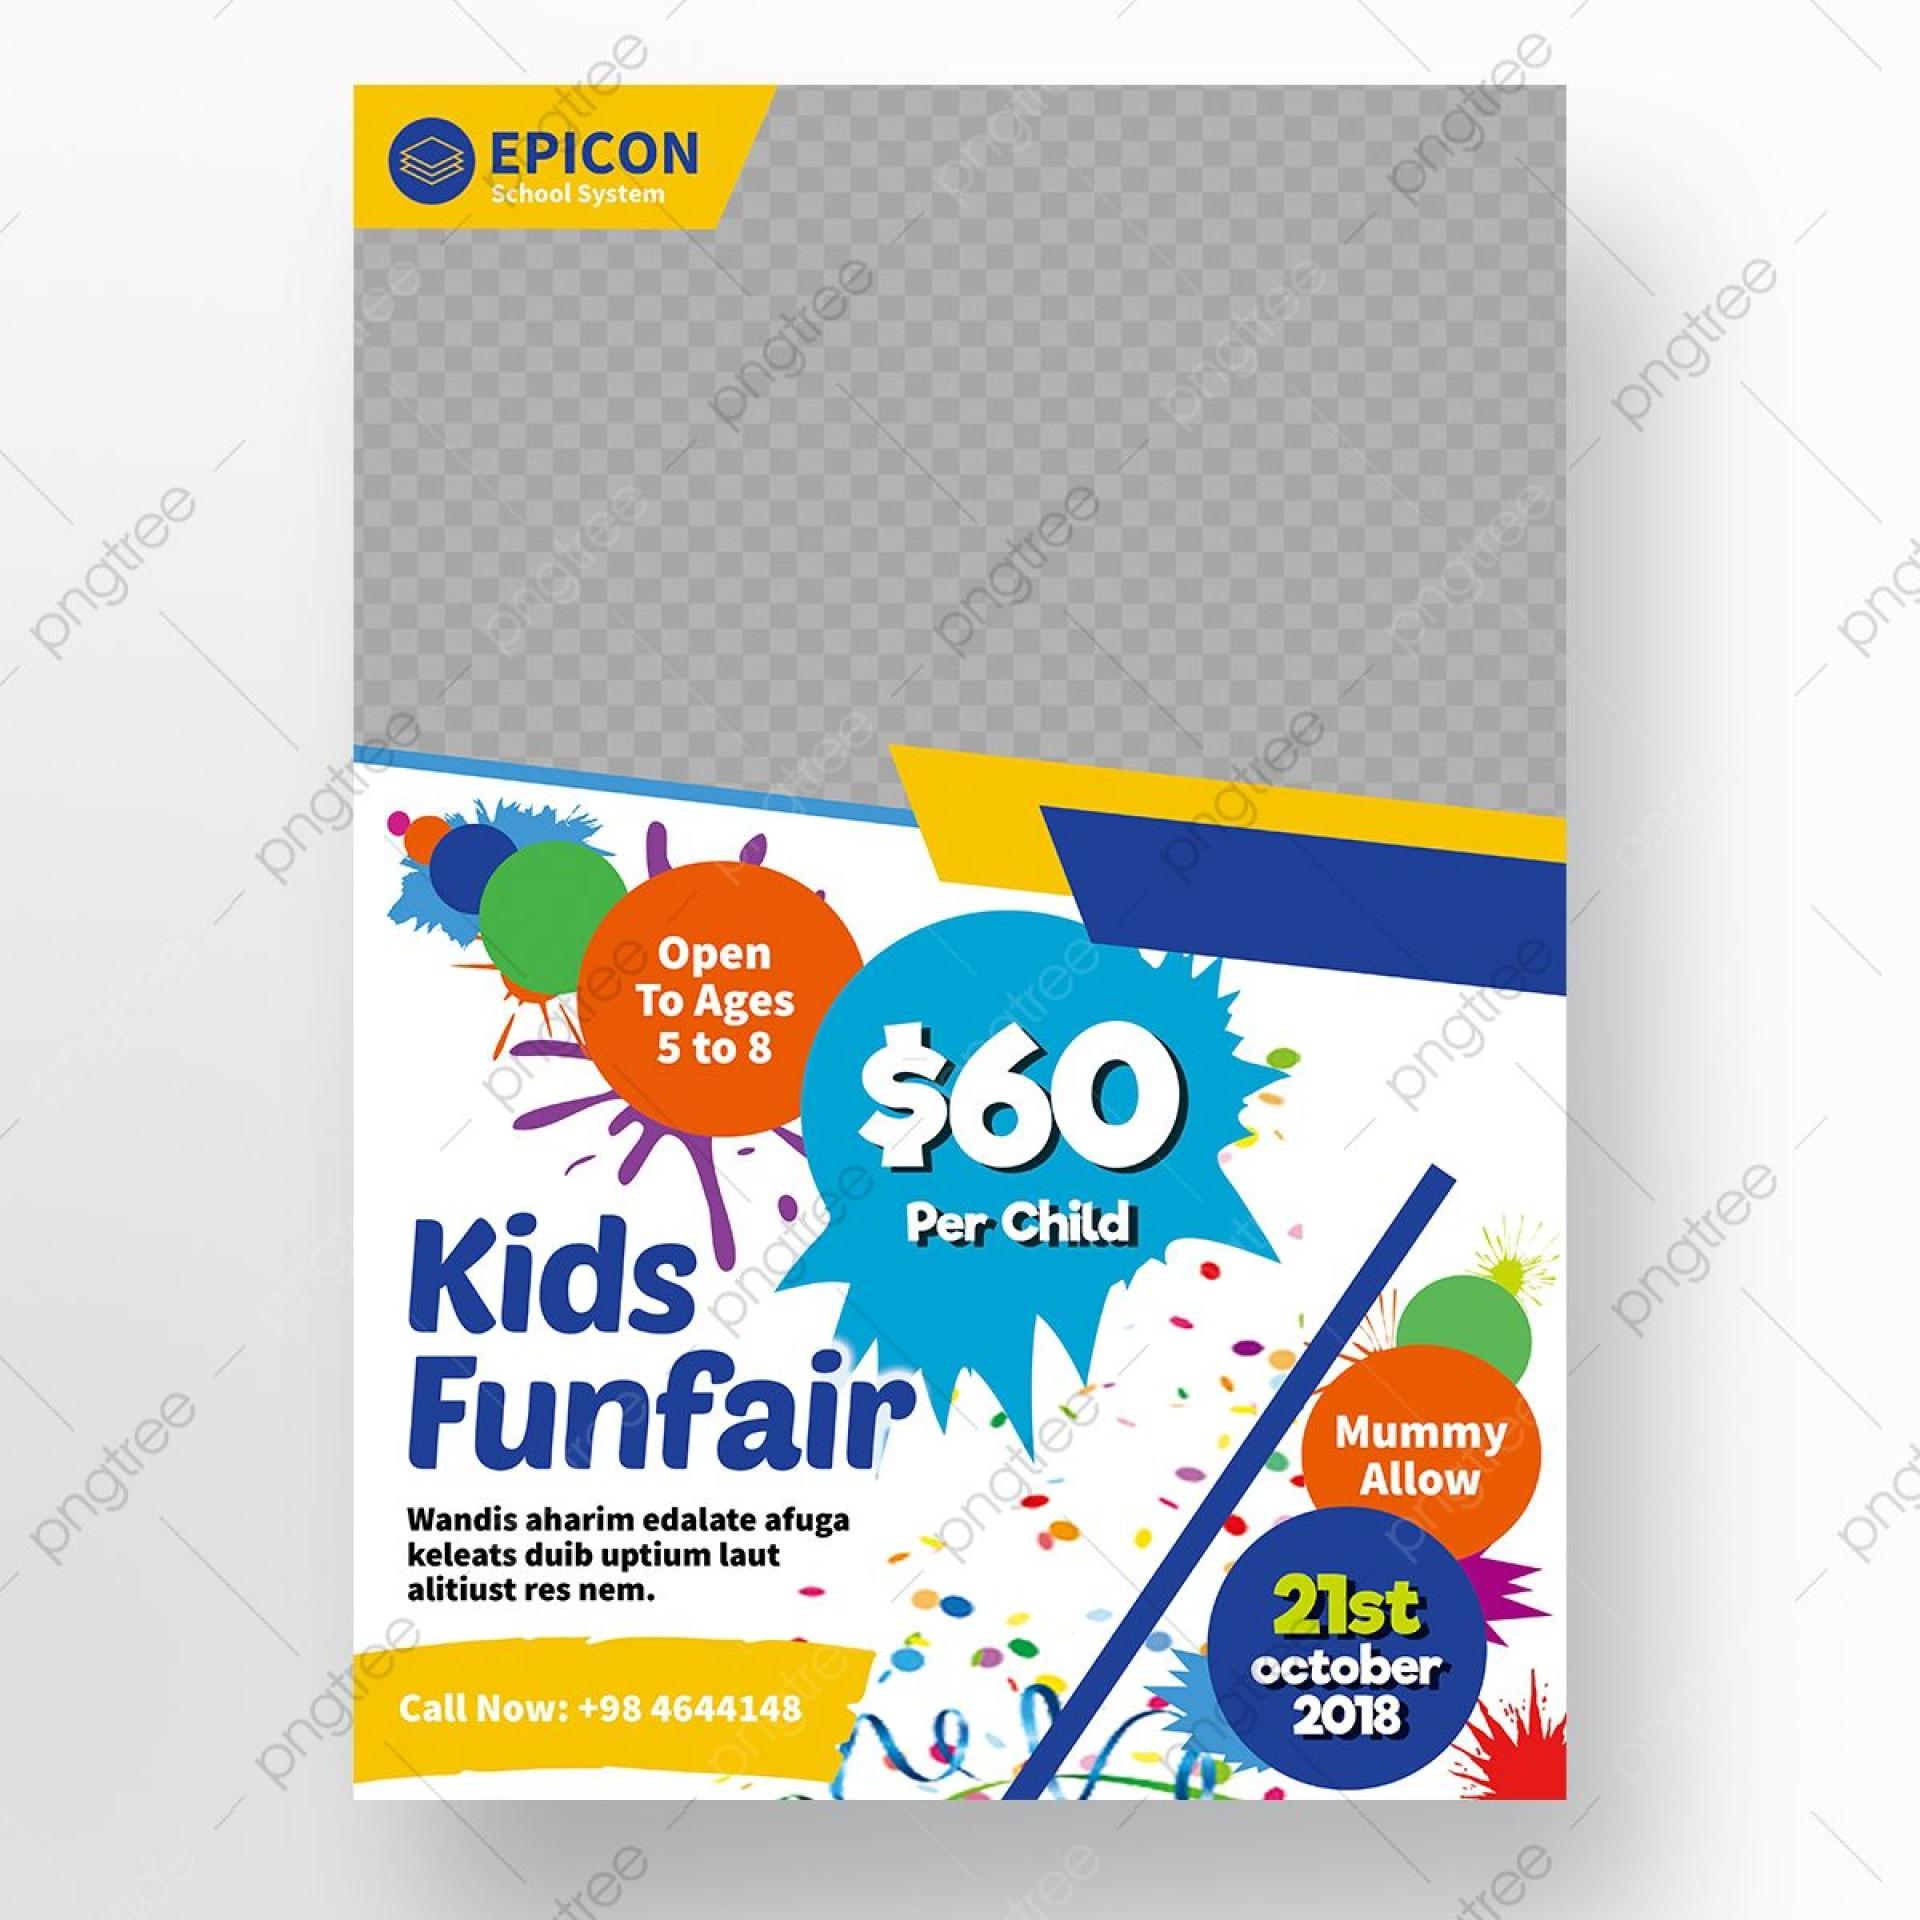 006 Wondrou Free School Flyer Design Template Highest Clarity  Templates Creative Education Poster1920